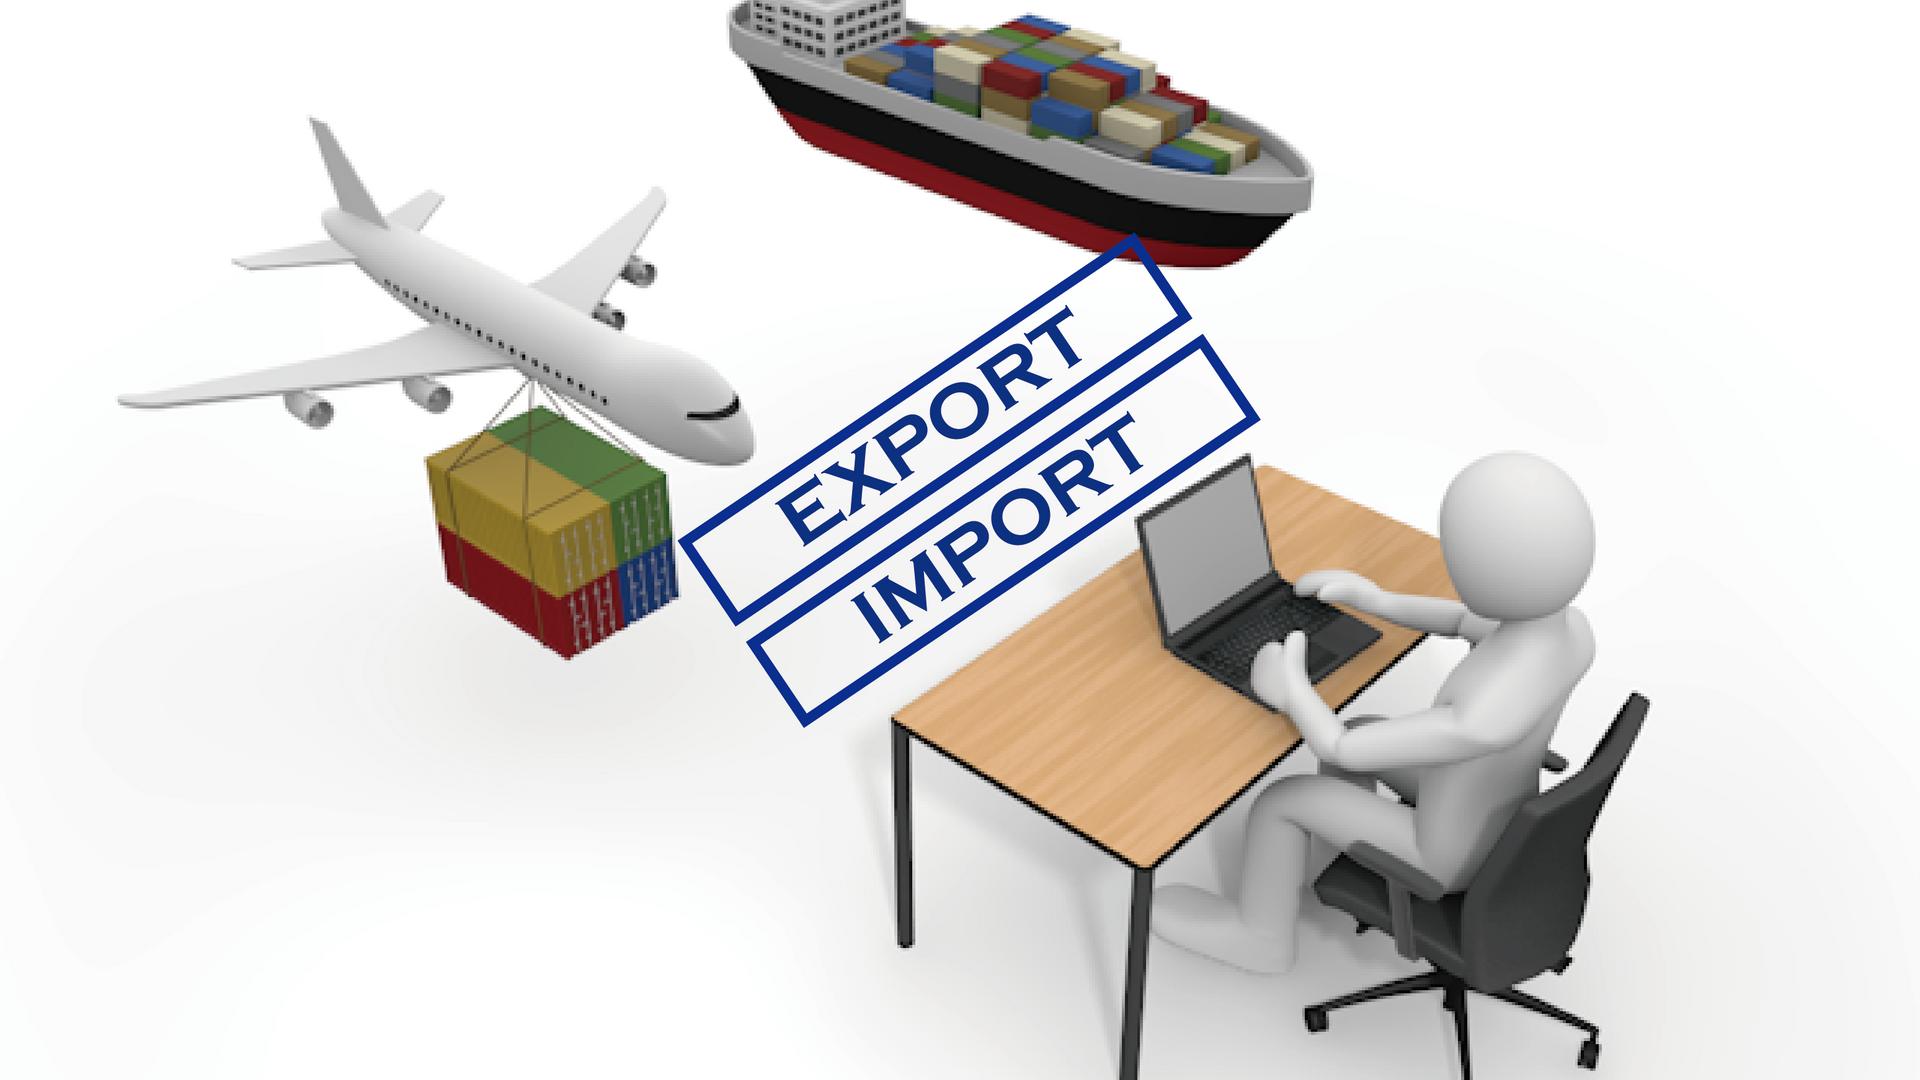 imprt-export.png